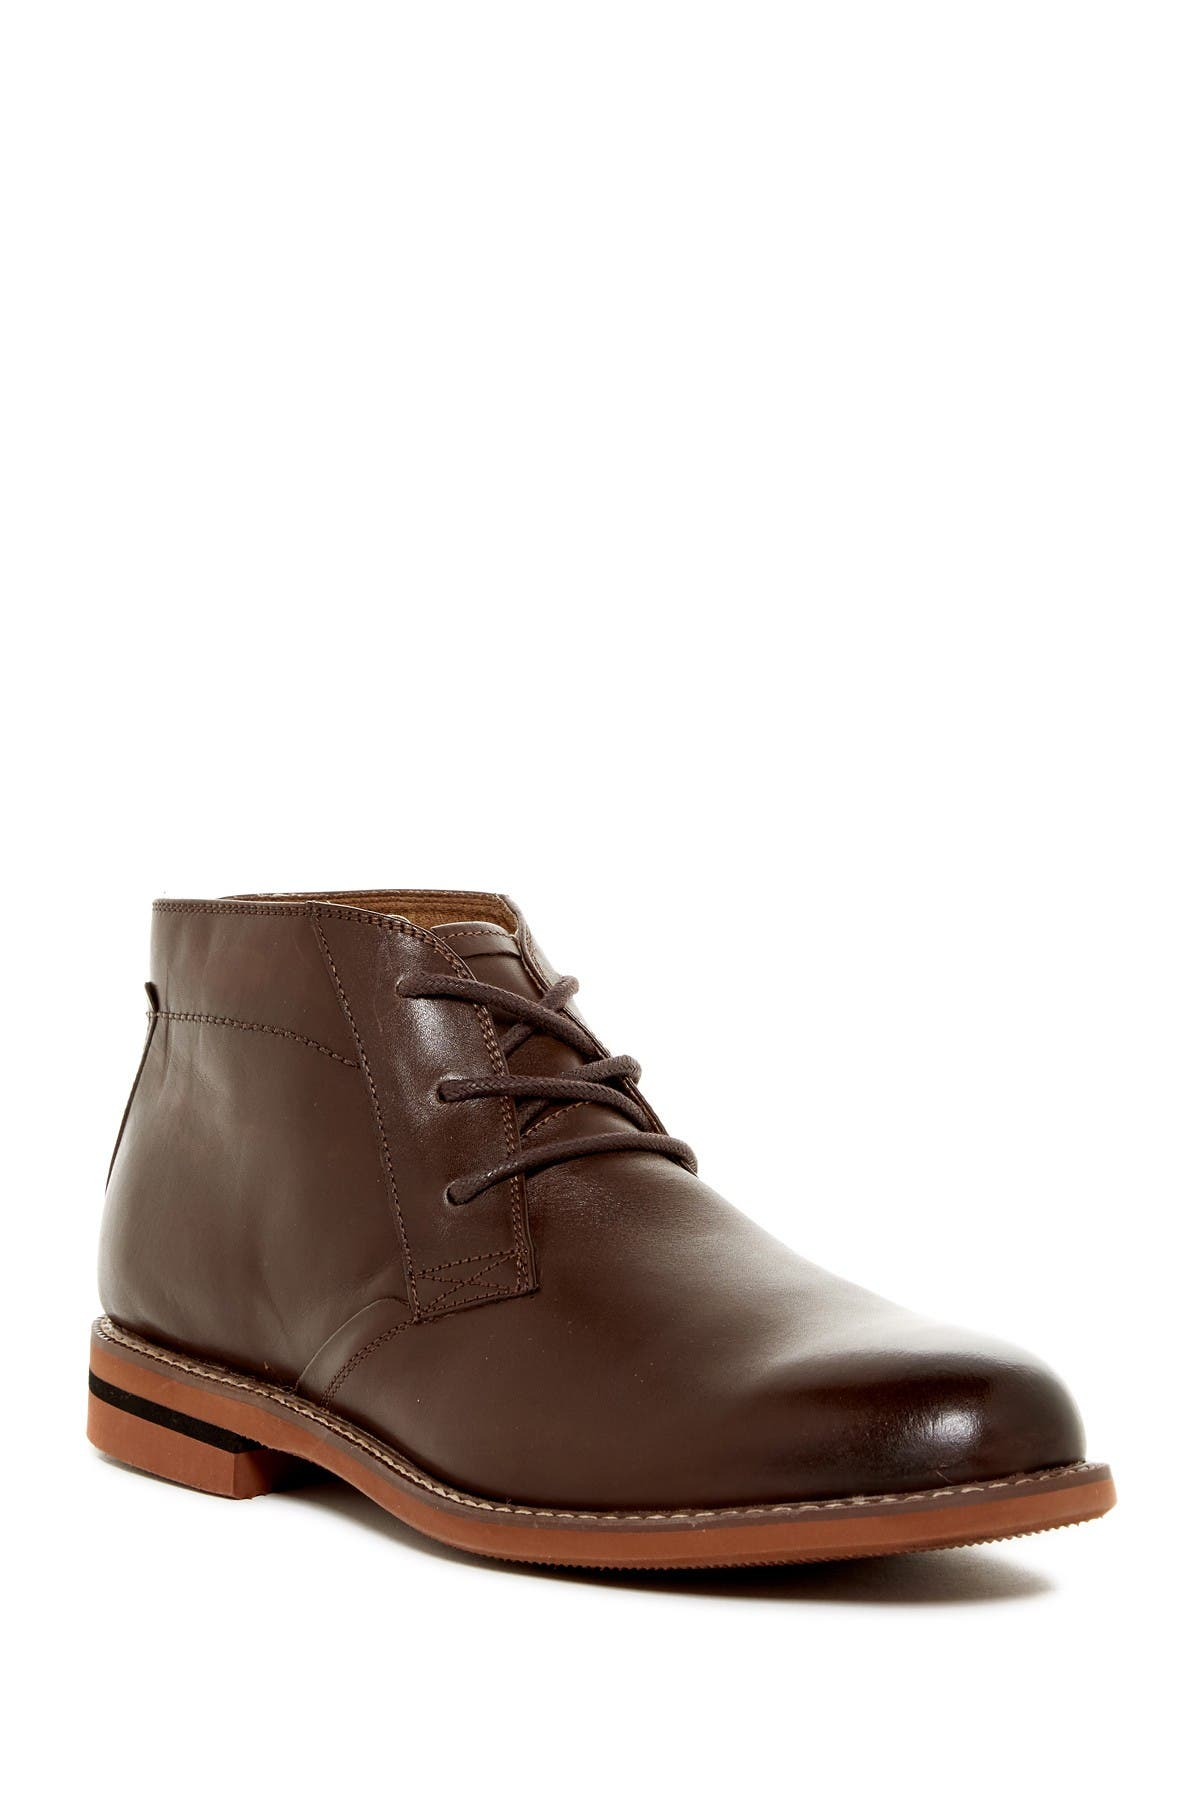 Image of Florsheim Dusk Chukka Leather Boot